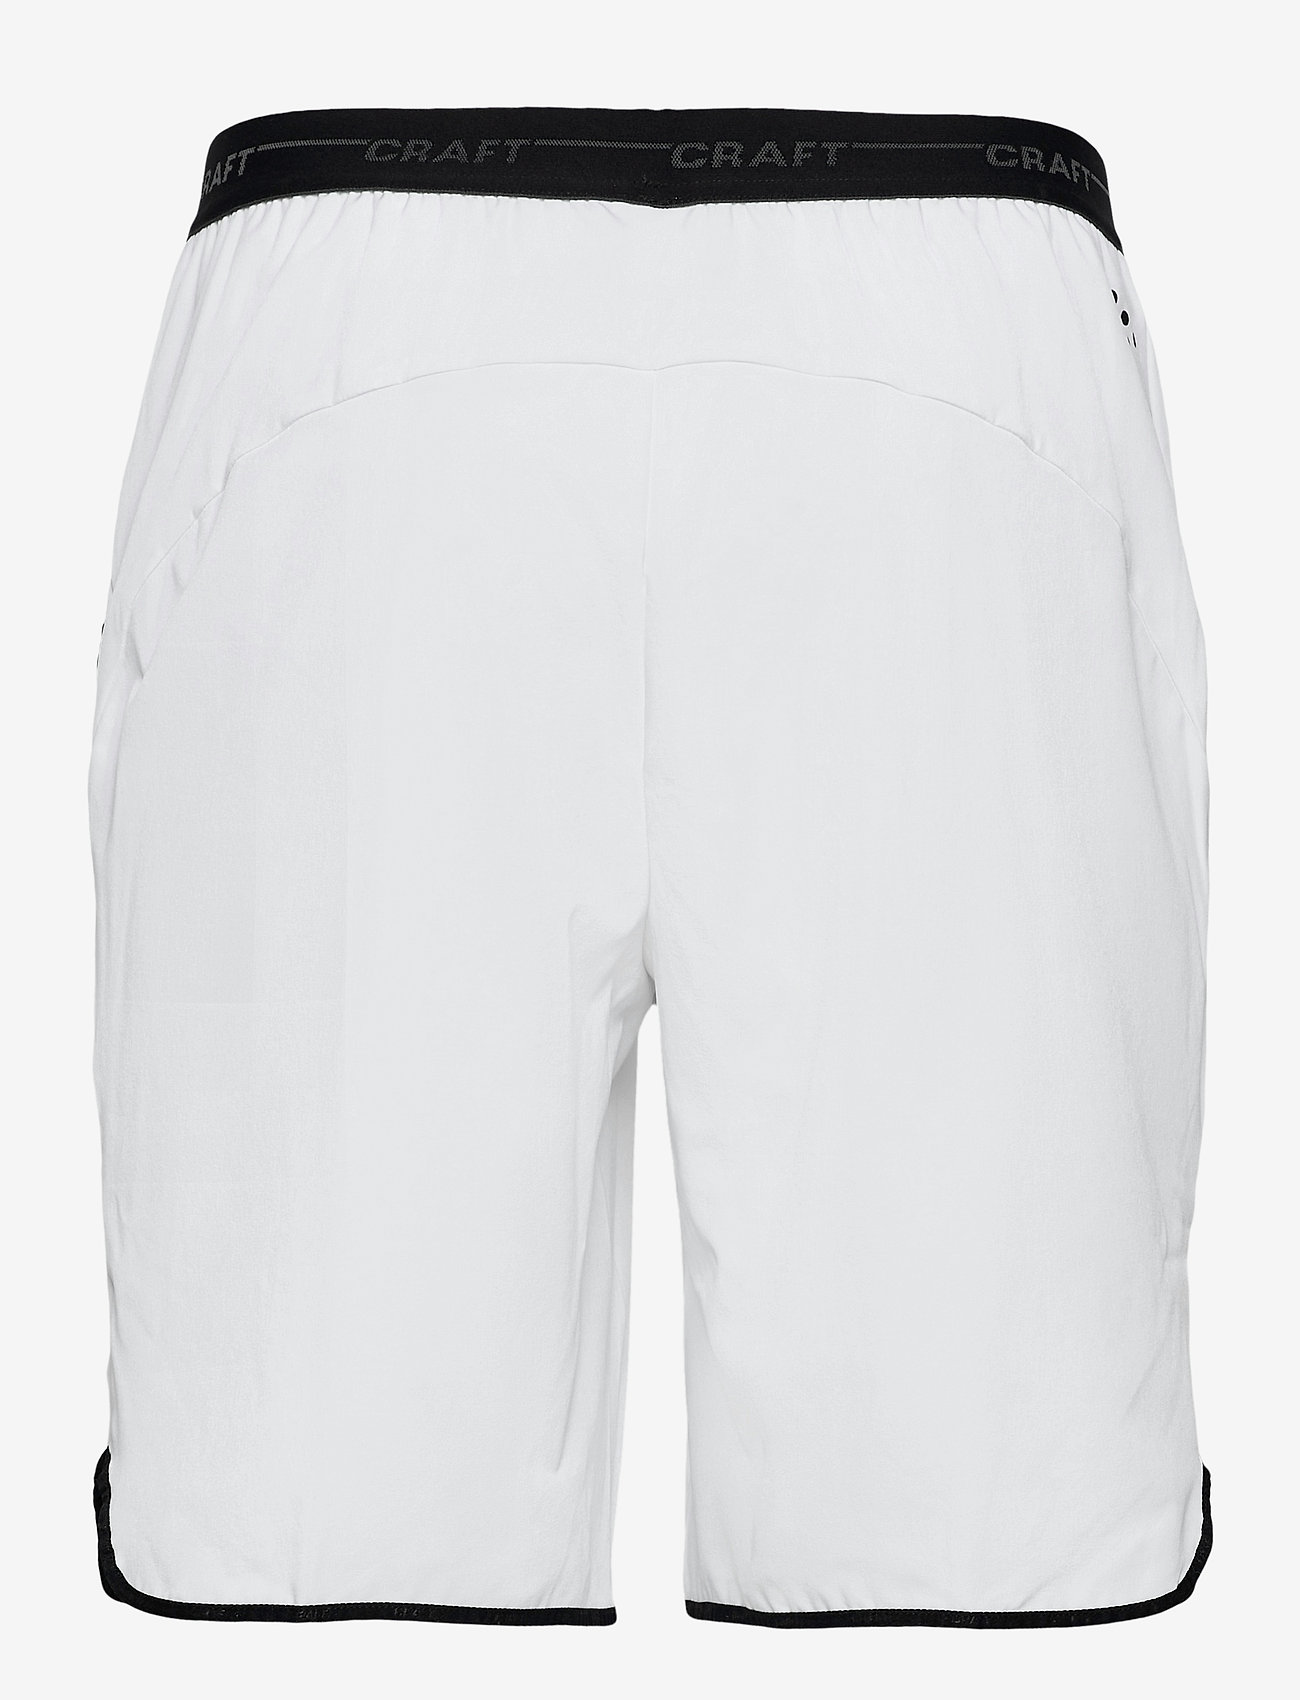 Craft - Pro Control Impact Shorts M - training korte broek - white/black - 1